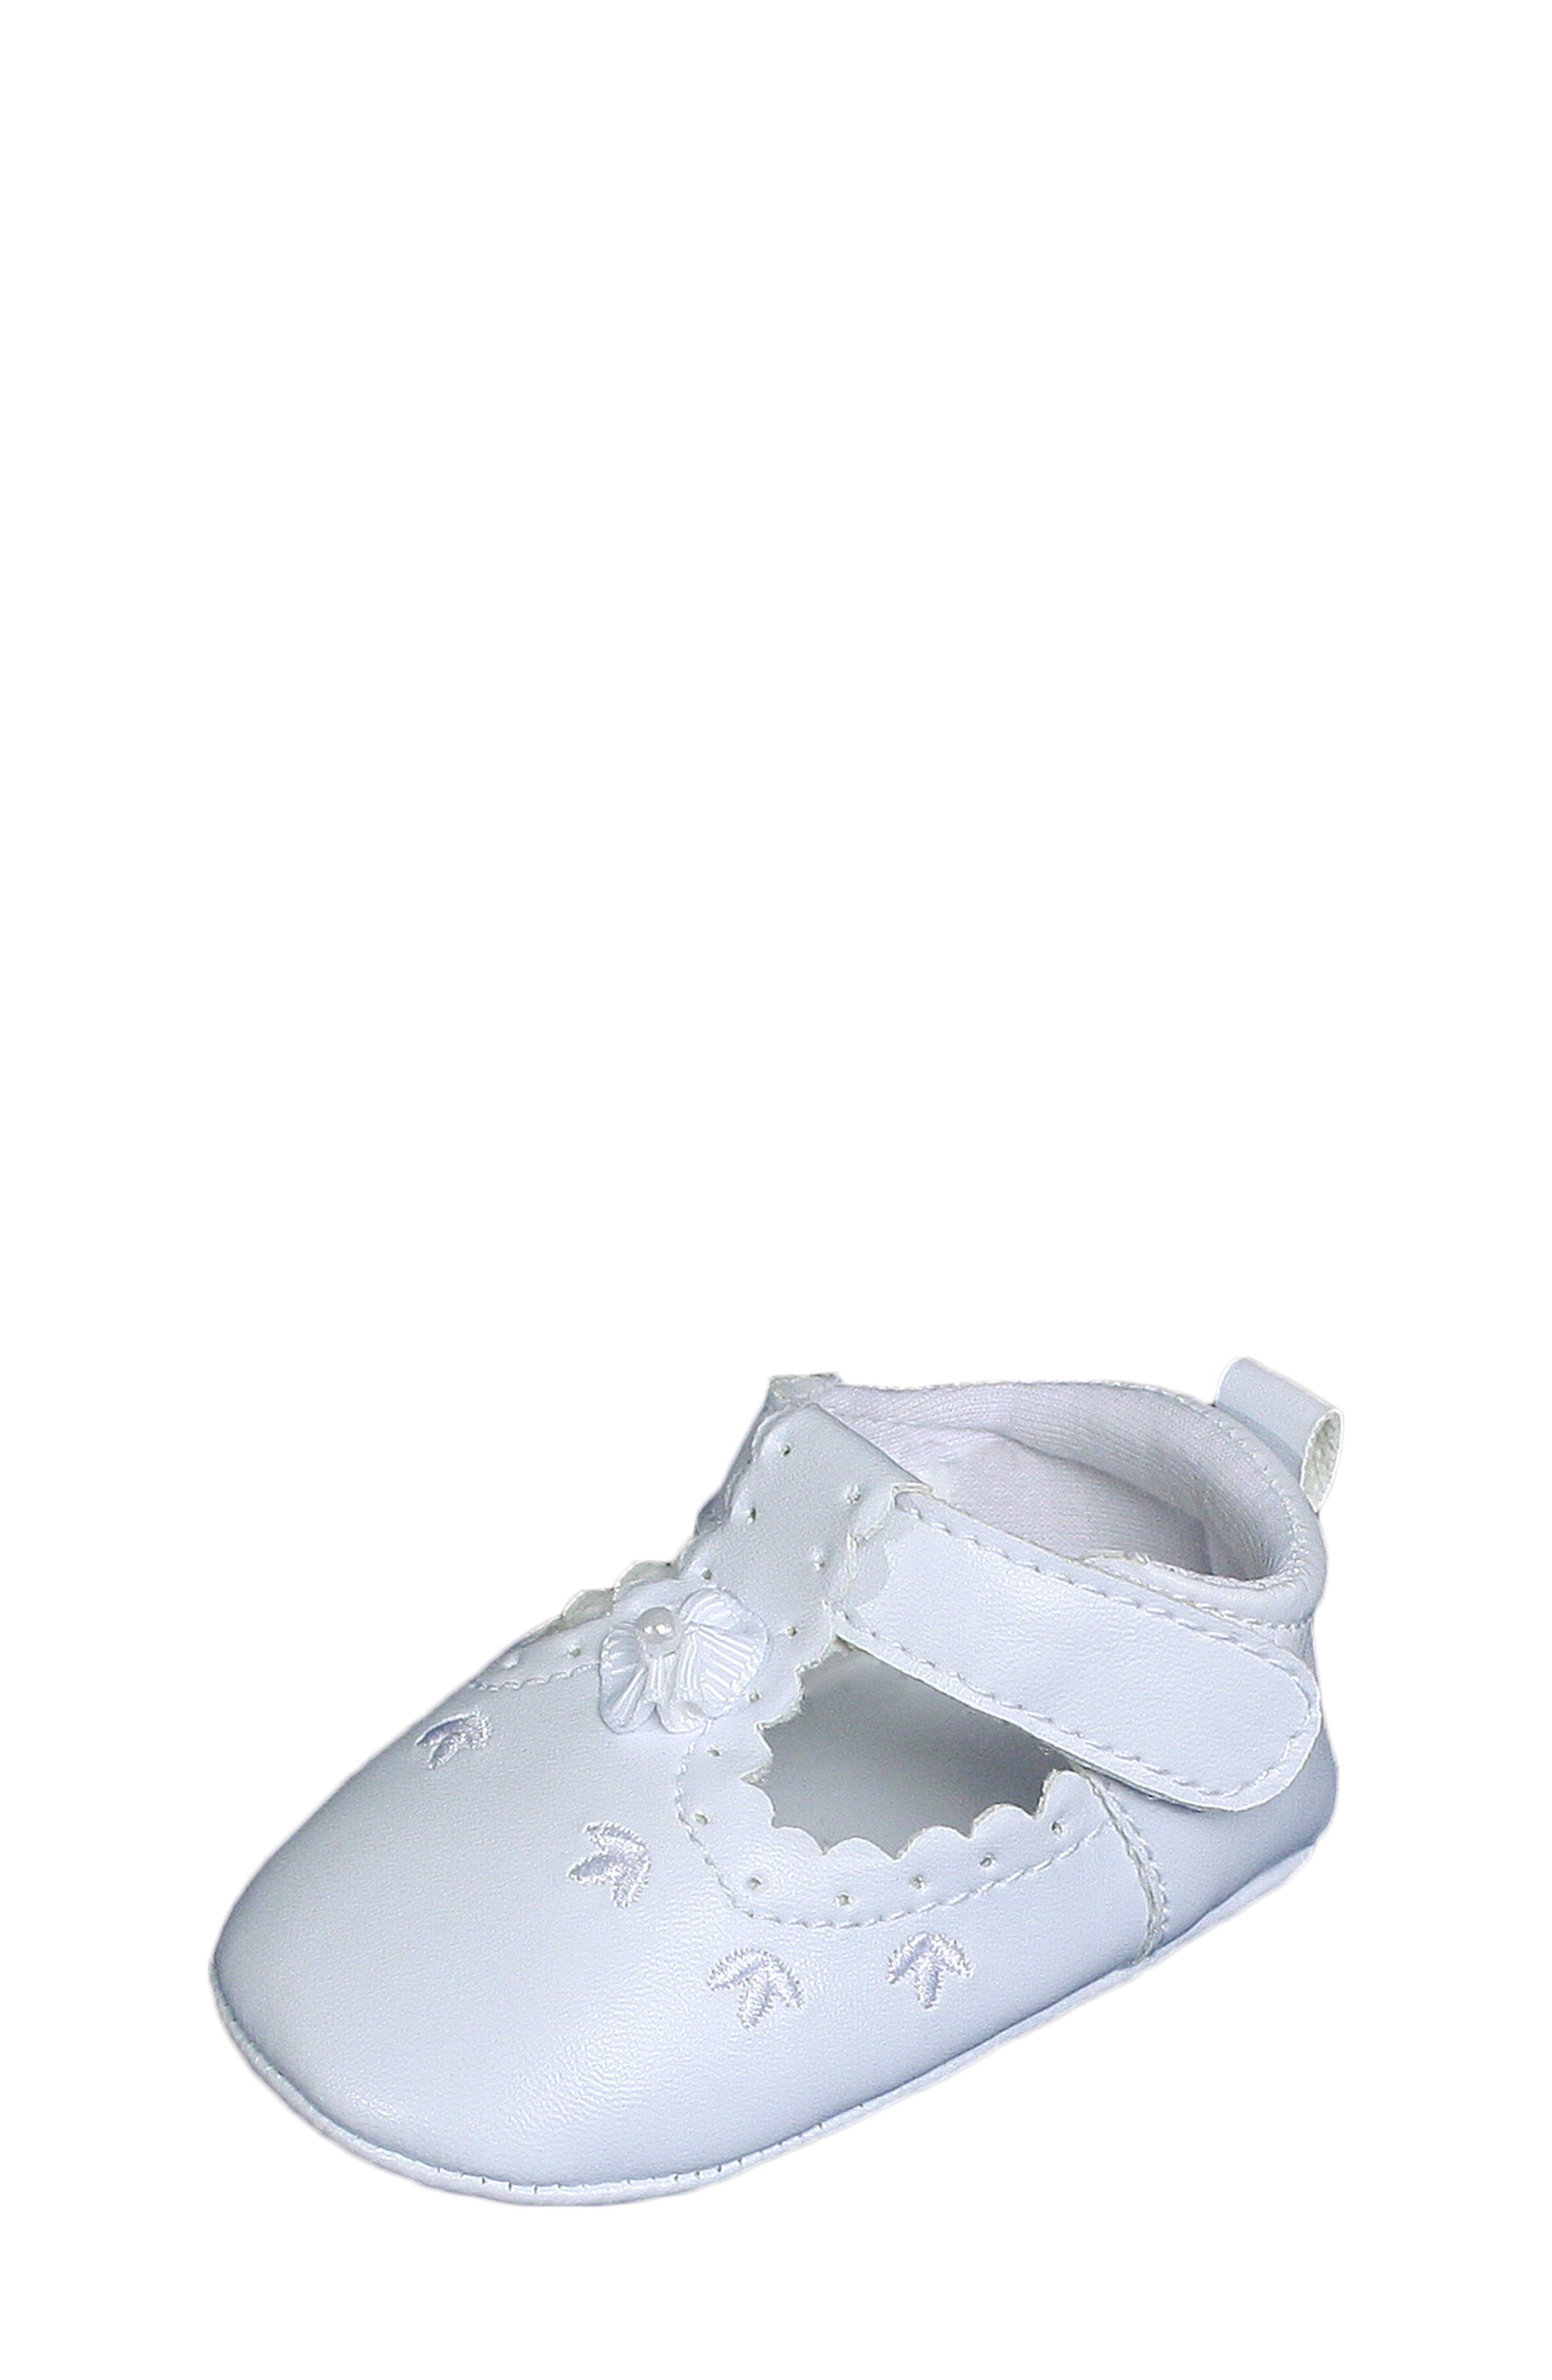 Mary Jane Crib Shoe,                             Alternate thumbnail 4, color,                             WHITE